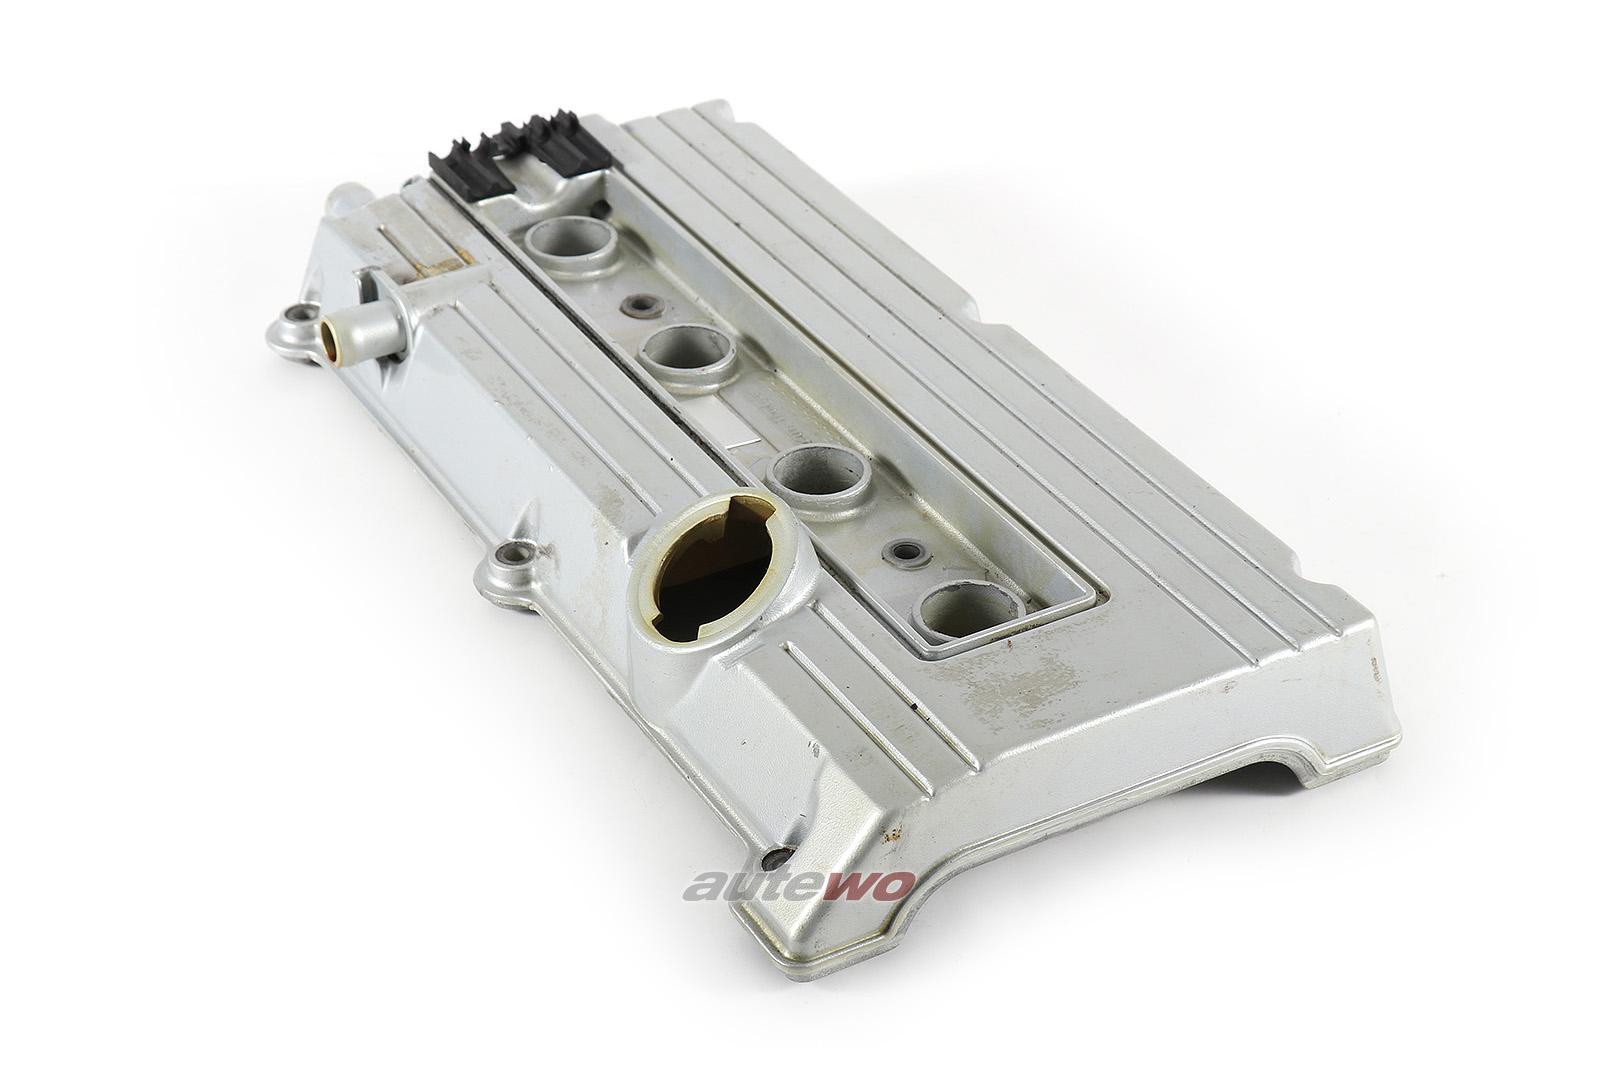 077103475F 077103471C Audi V8 D11/S4/S6 C4 3.6/4.2l Ventildeckel Links